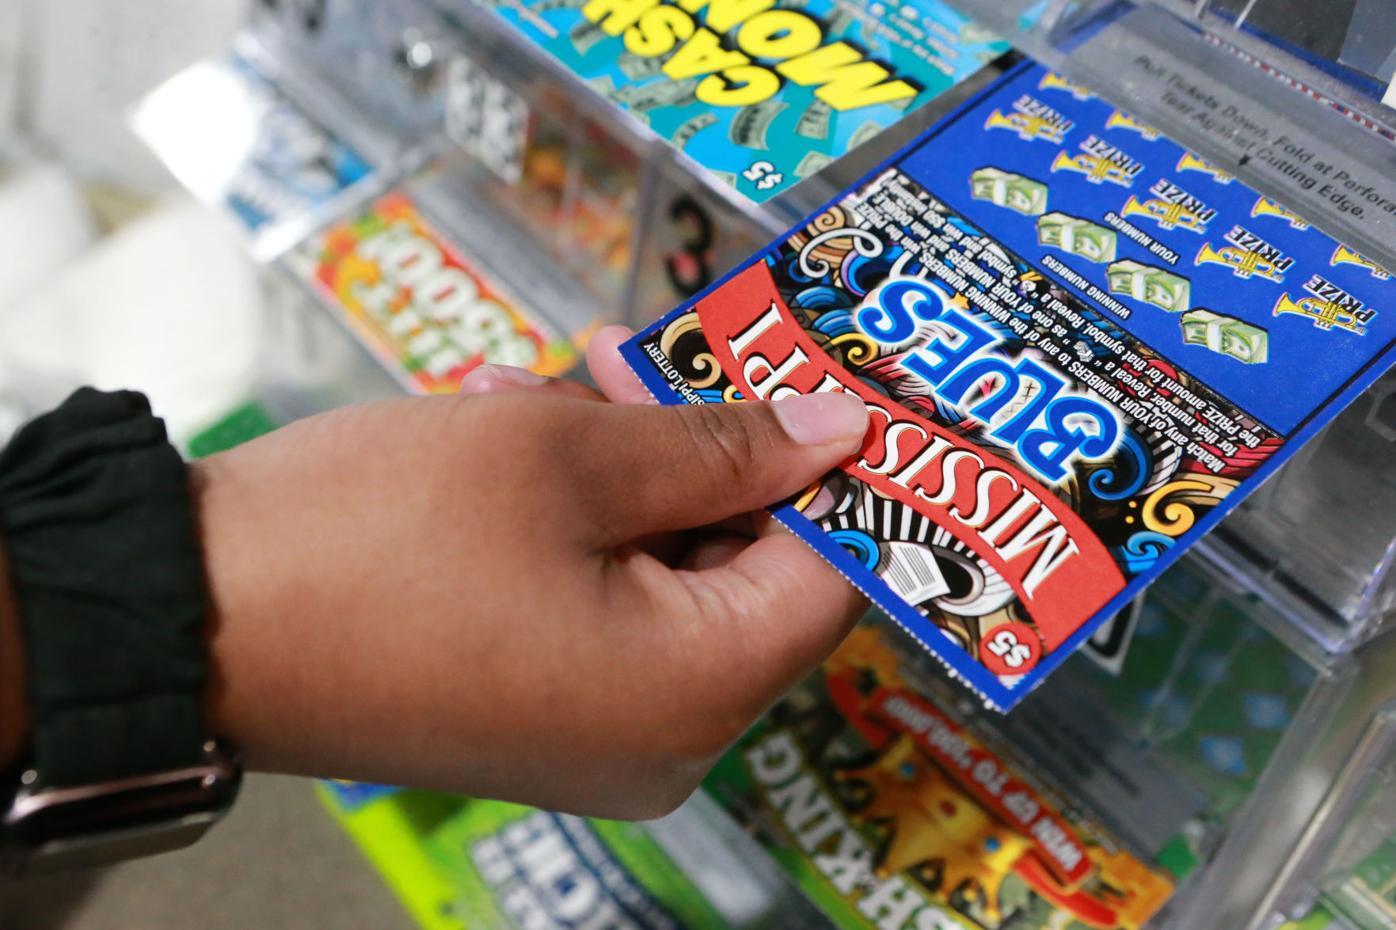 djr-2021-02-10-news-lottery-twp1